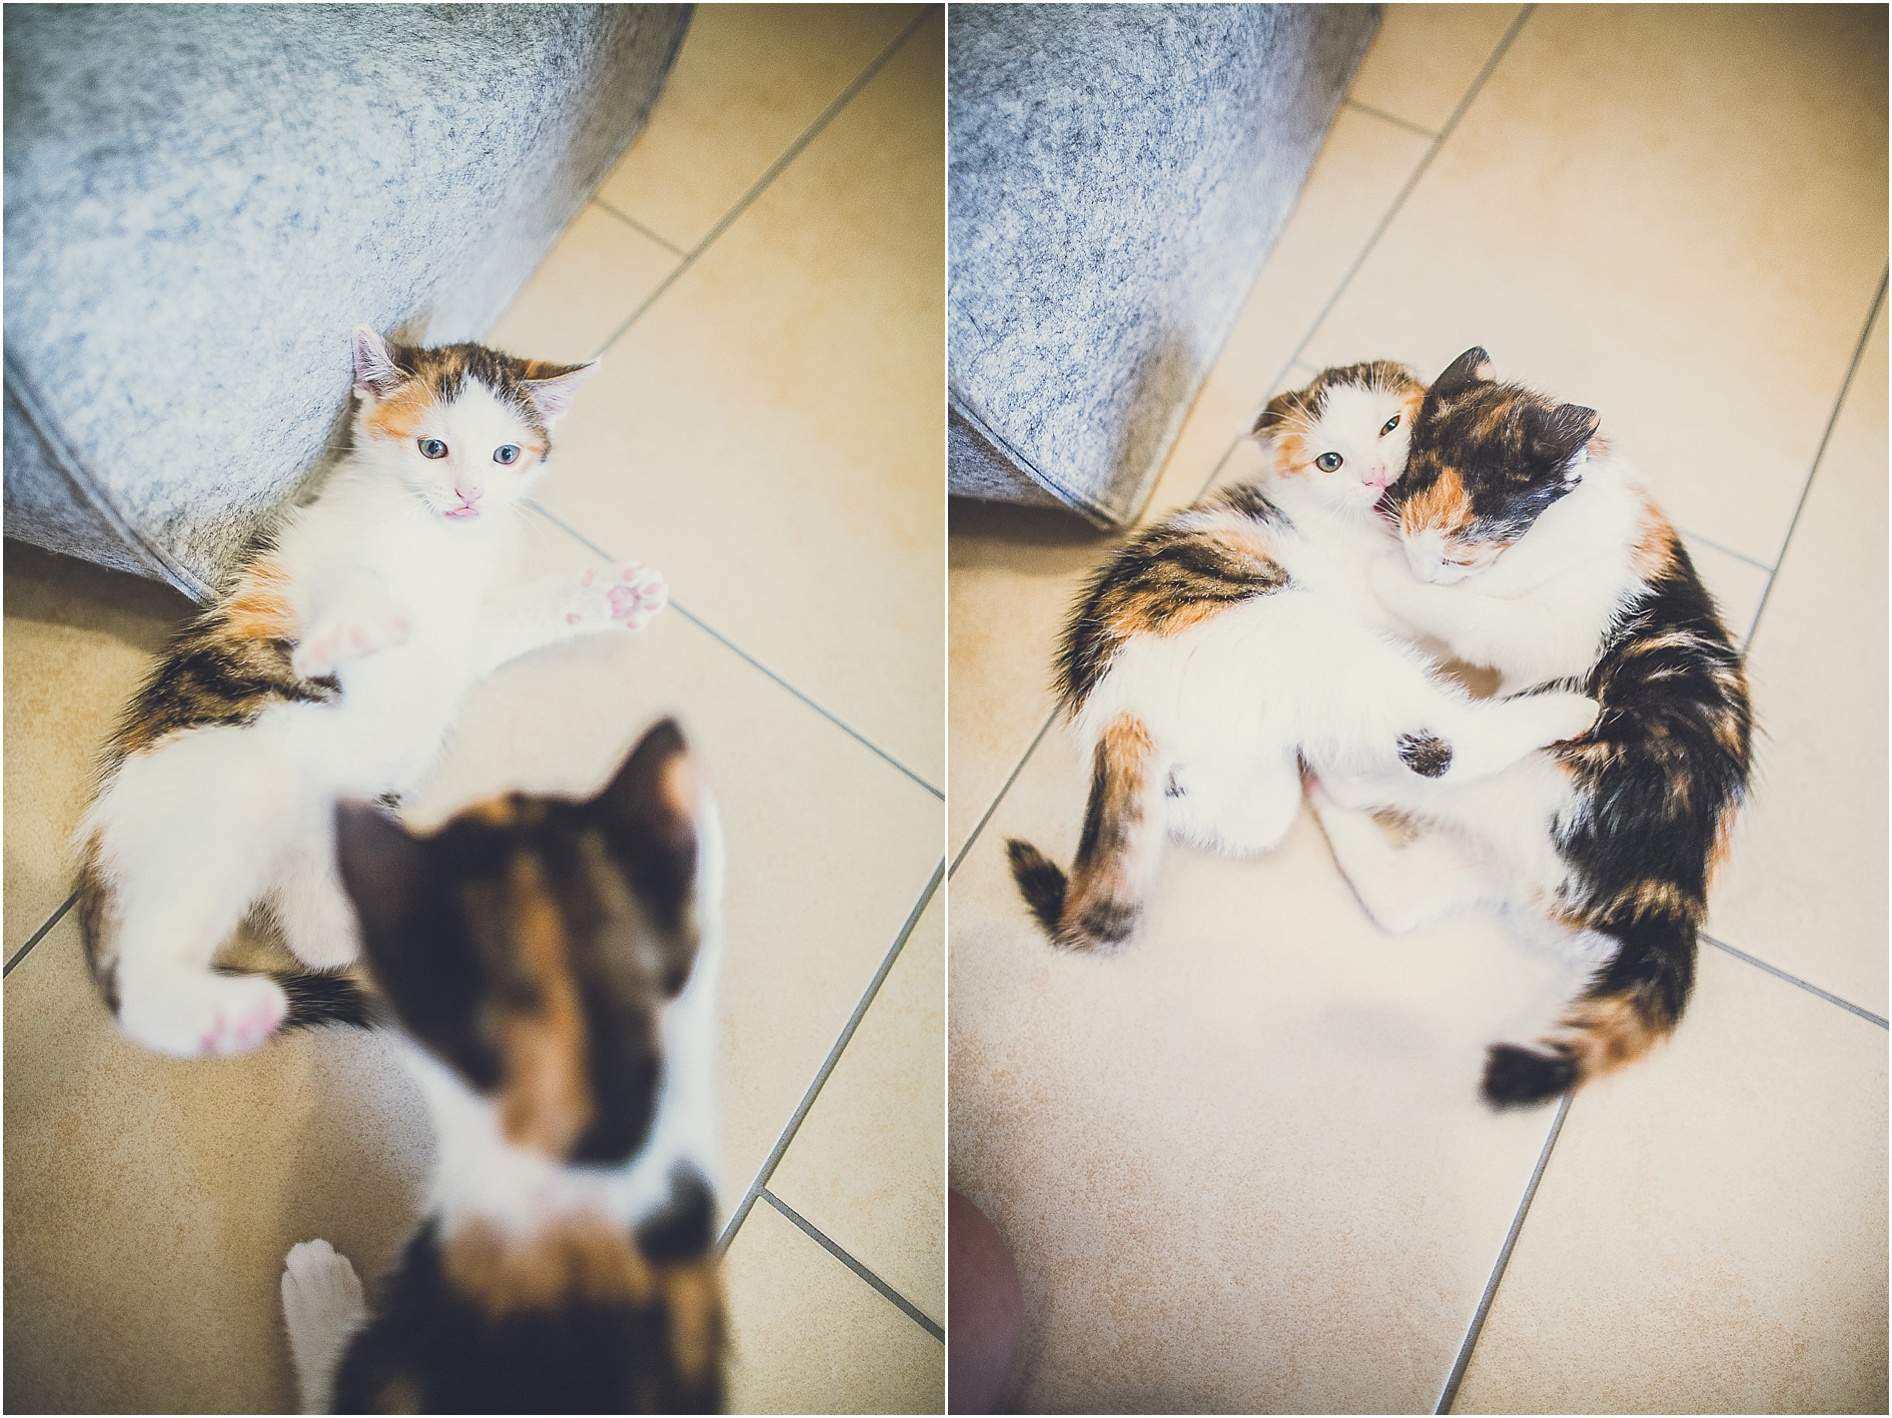 2014-07-23_0011 Paula & Frieda, zwei bezaubernde Kitten